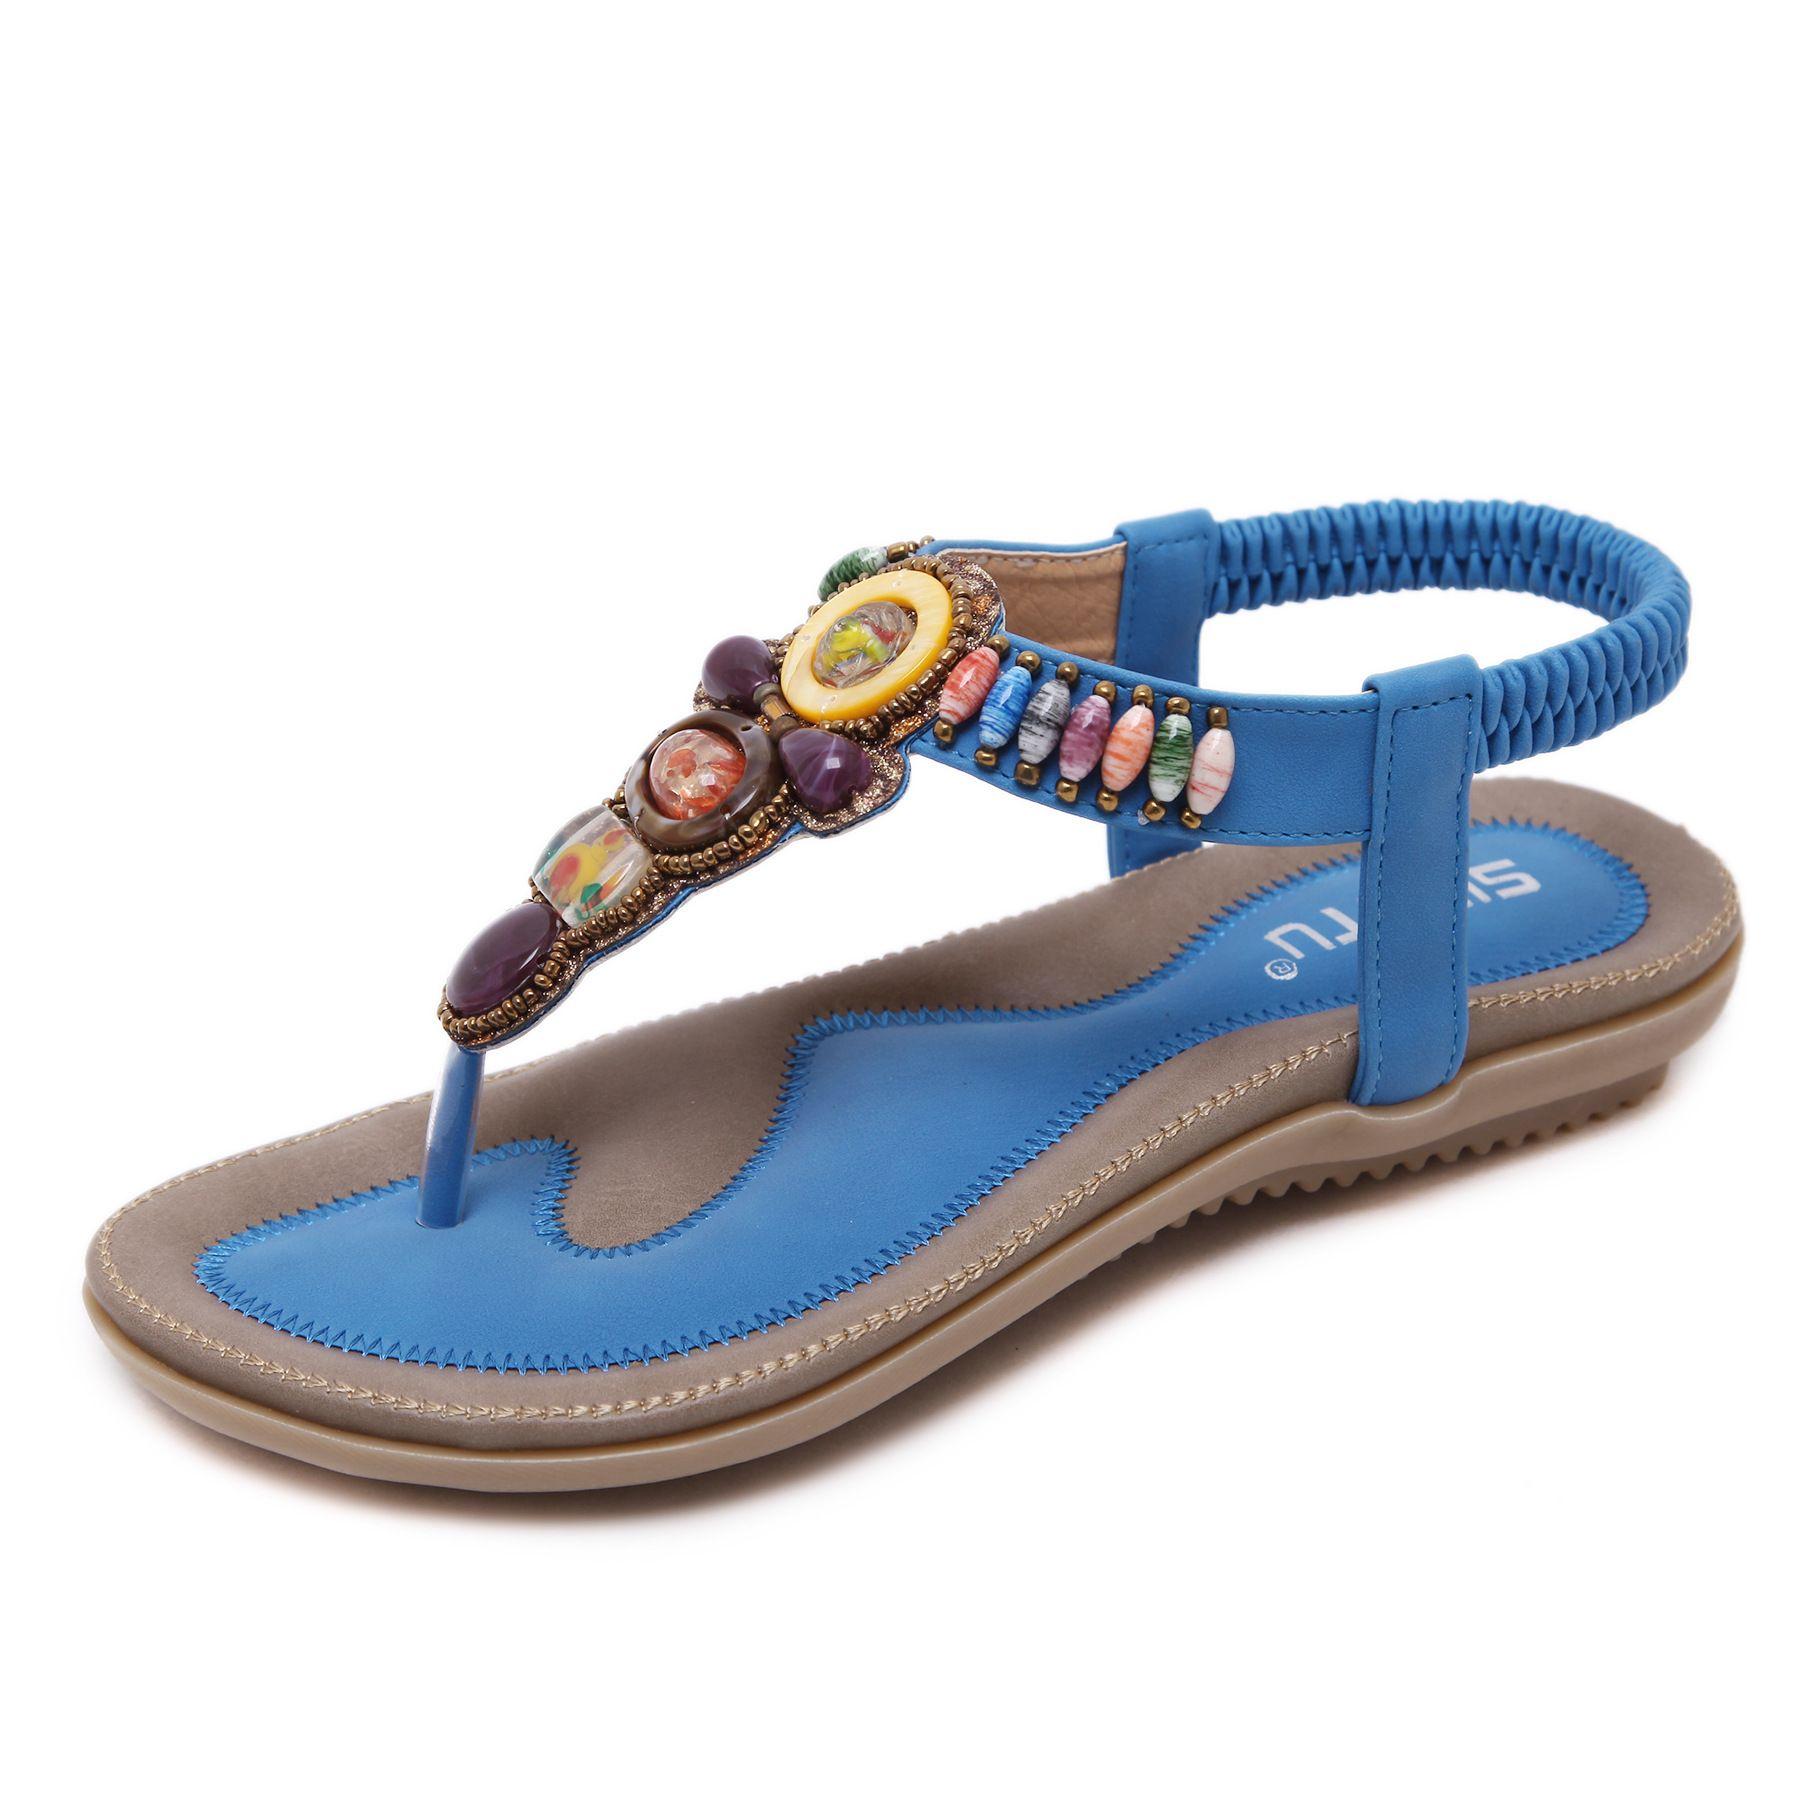 Women Bohemian Sandals Flat Flip Flops Clip Toe Summer Gladiator Beach Shoes New